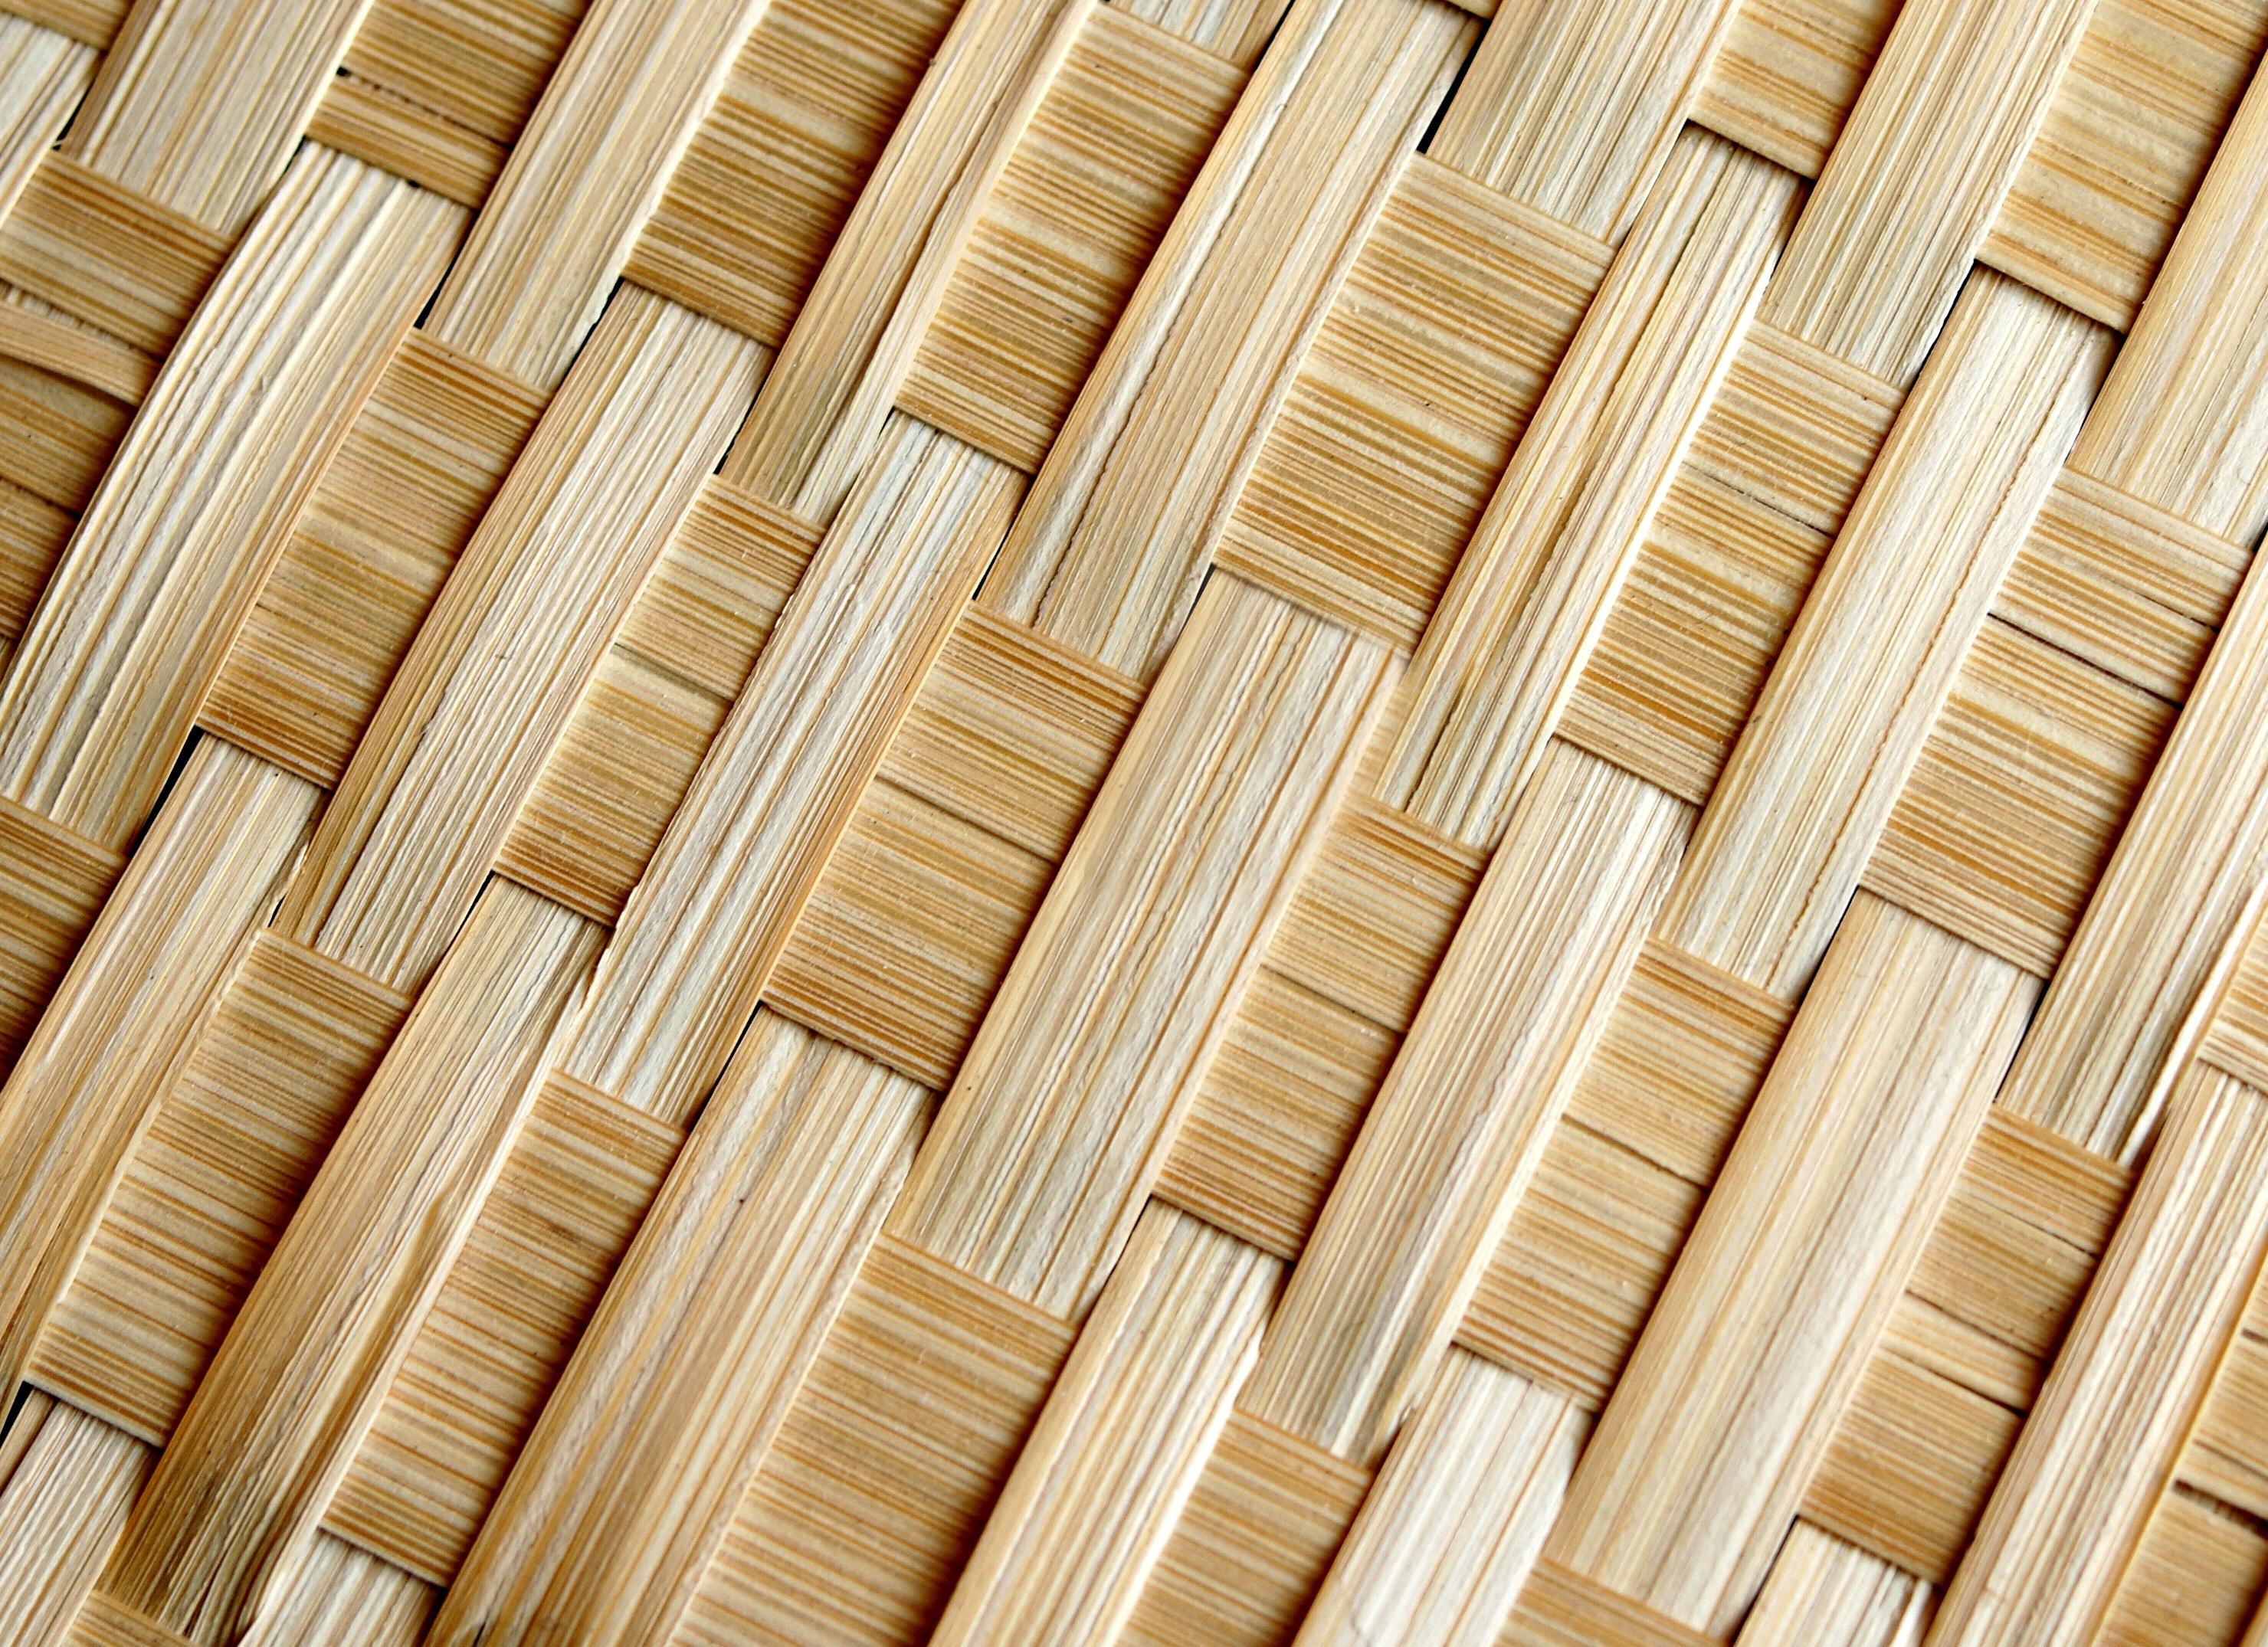 Free images texture floor building pattern line for Hi res interior design images